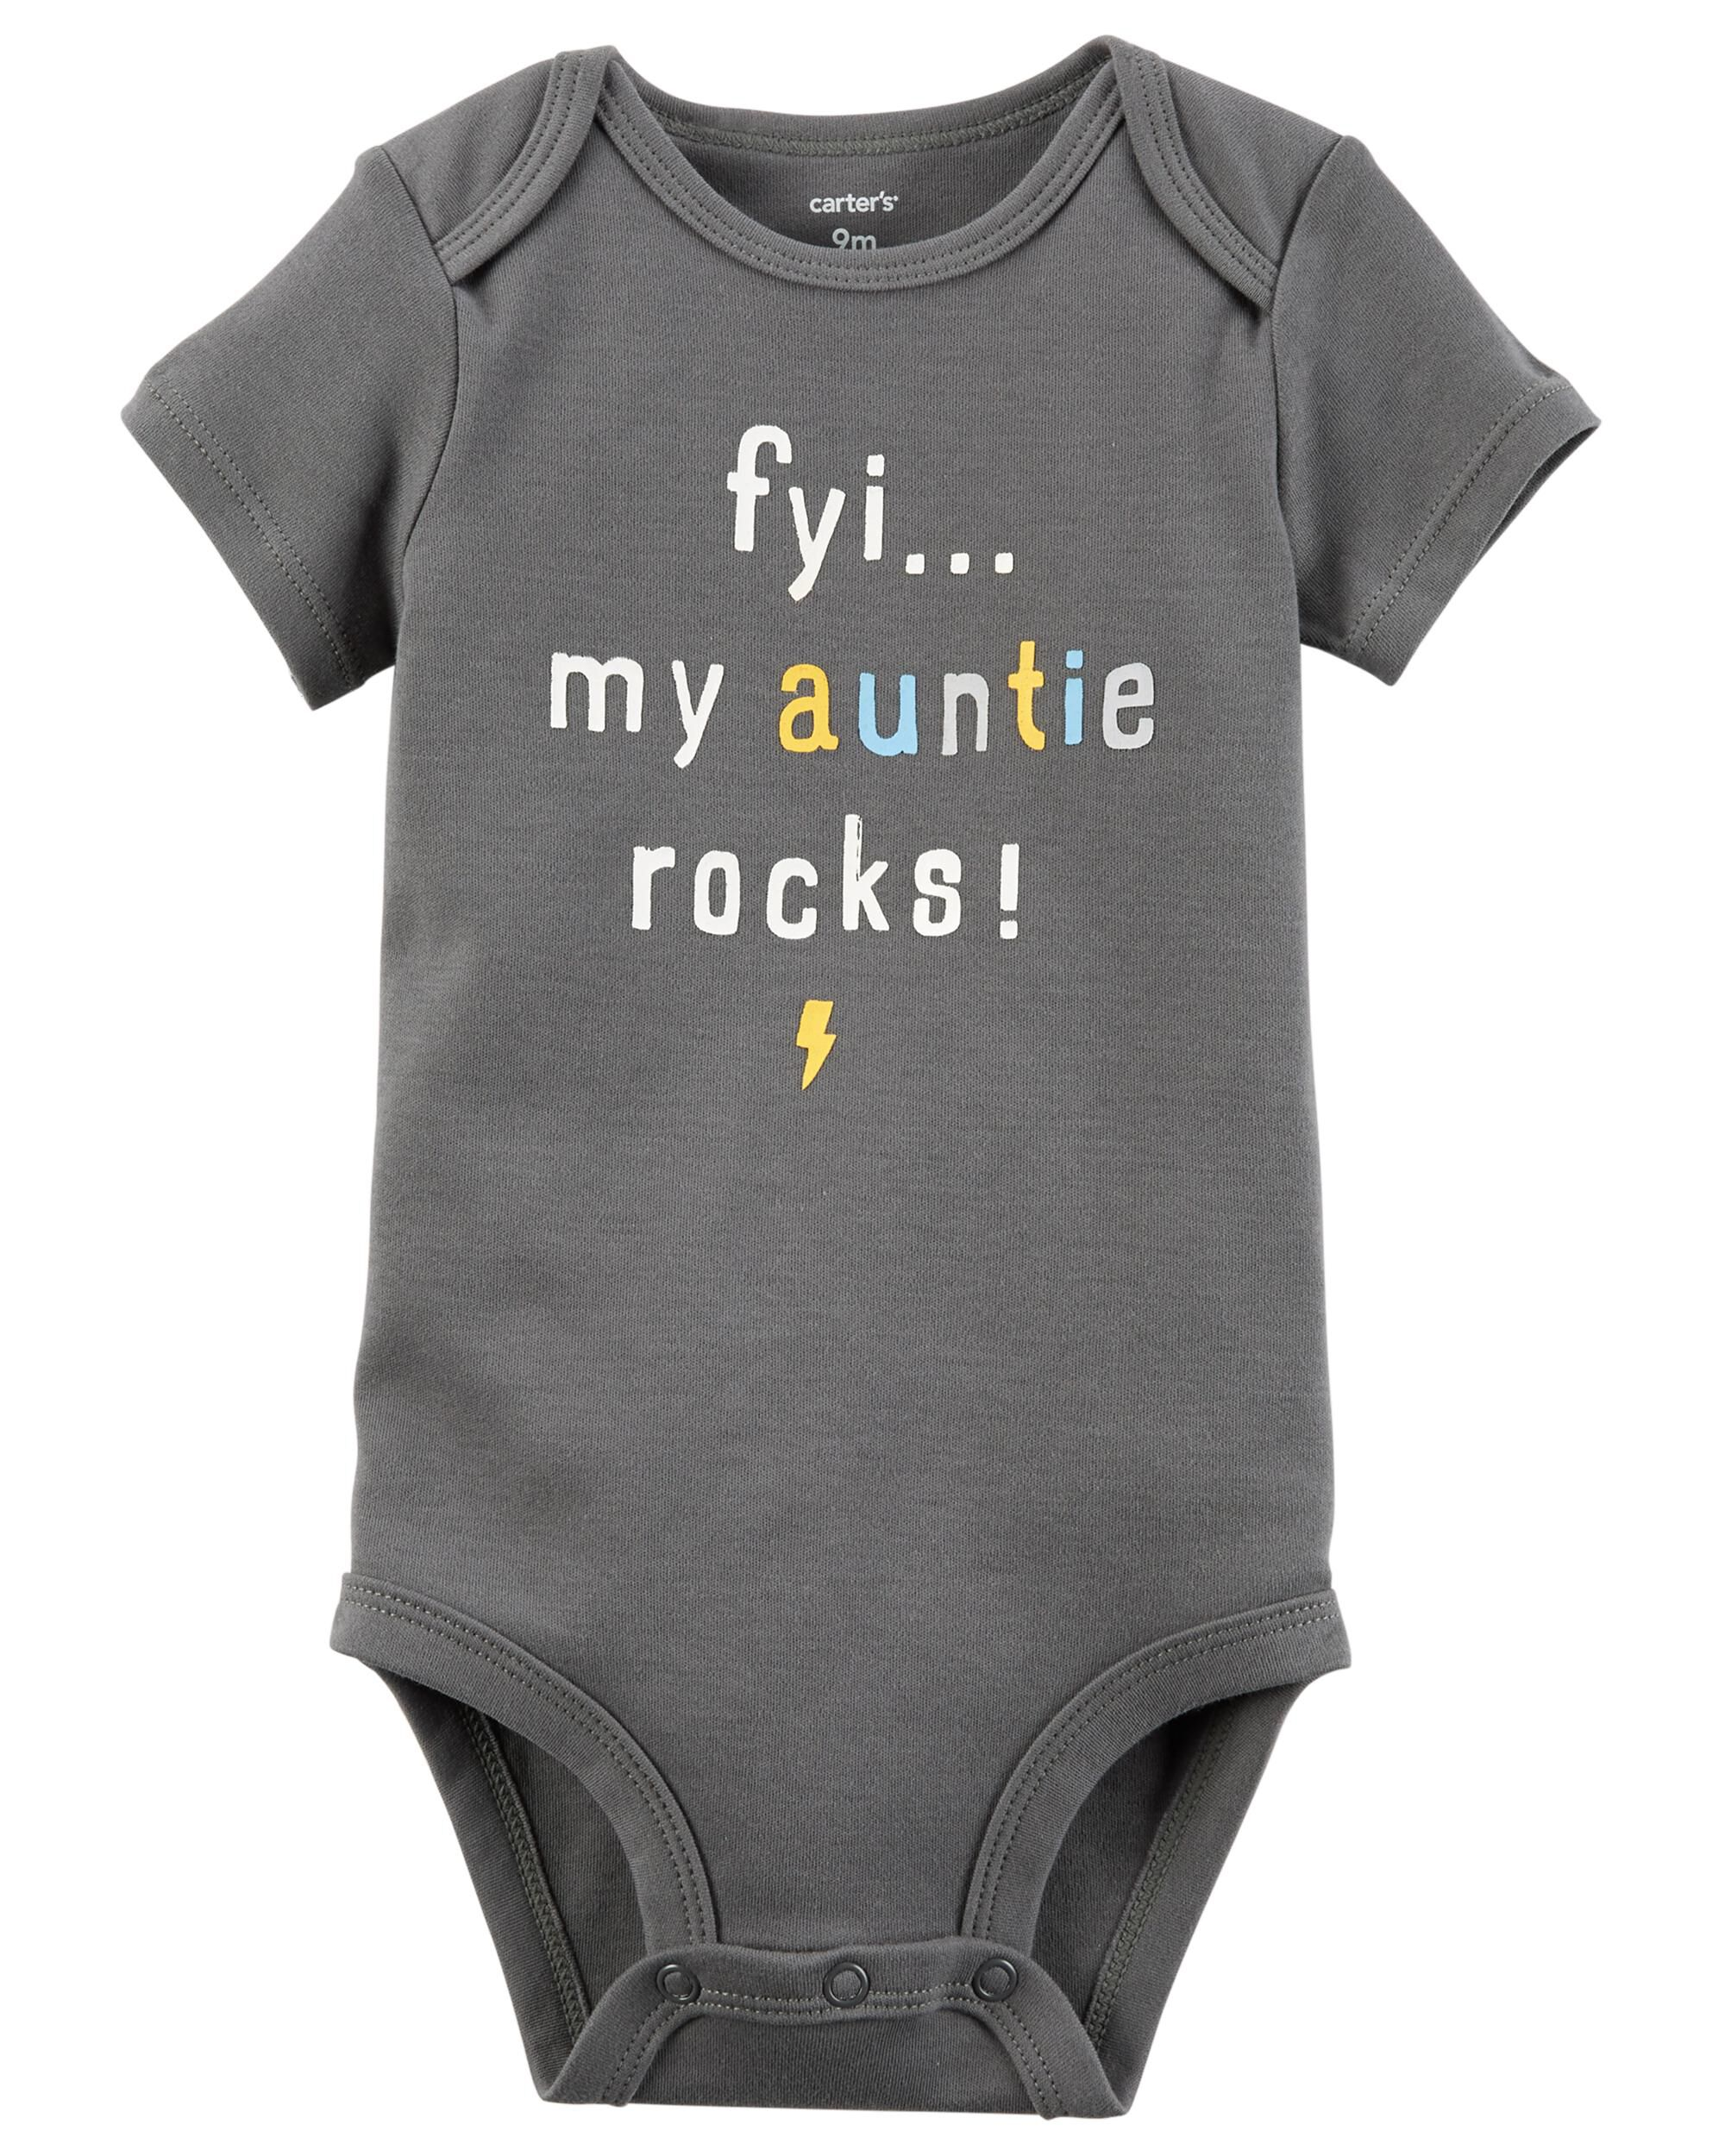 Auntie Rocks Collectible Bodysuit